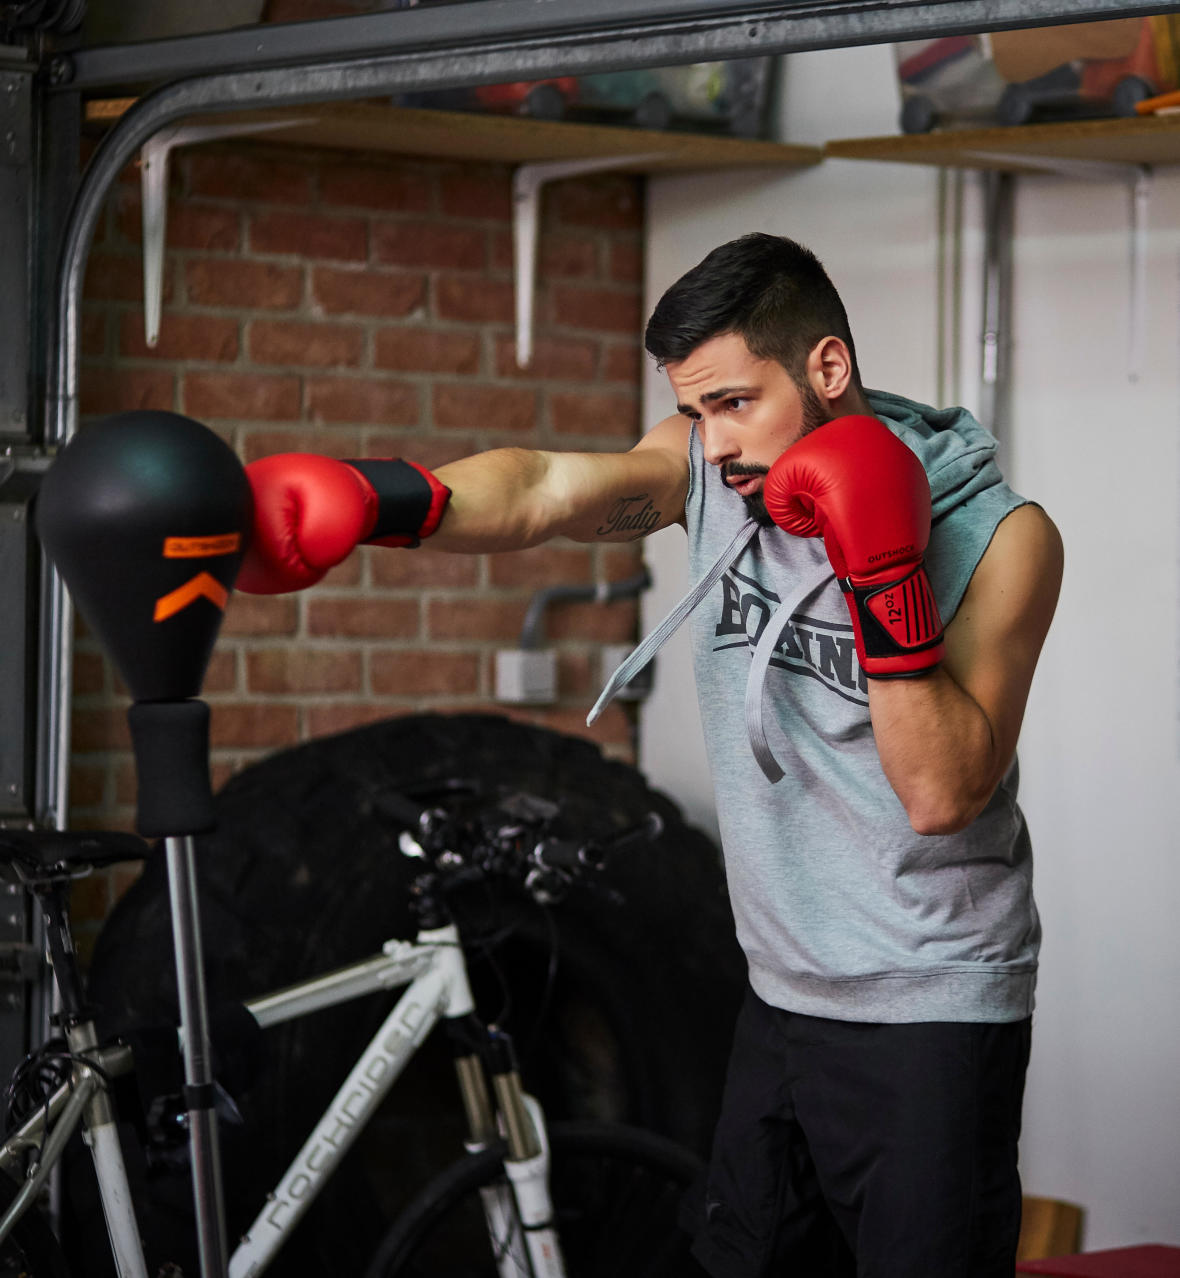 Putching Ball : comment boxer chez soi - Conseils Sports DECATHLON